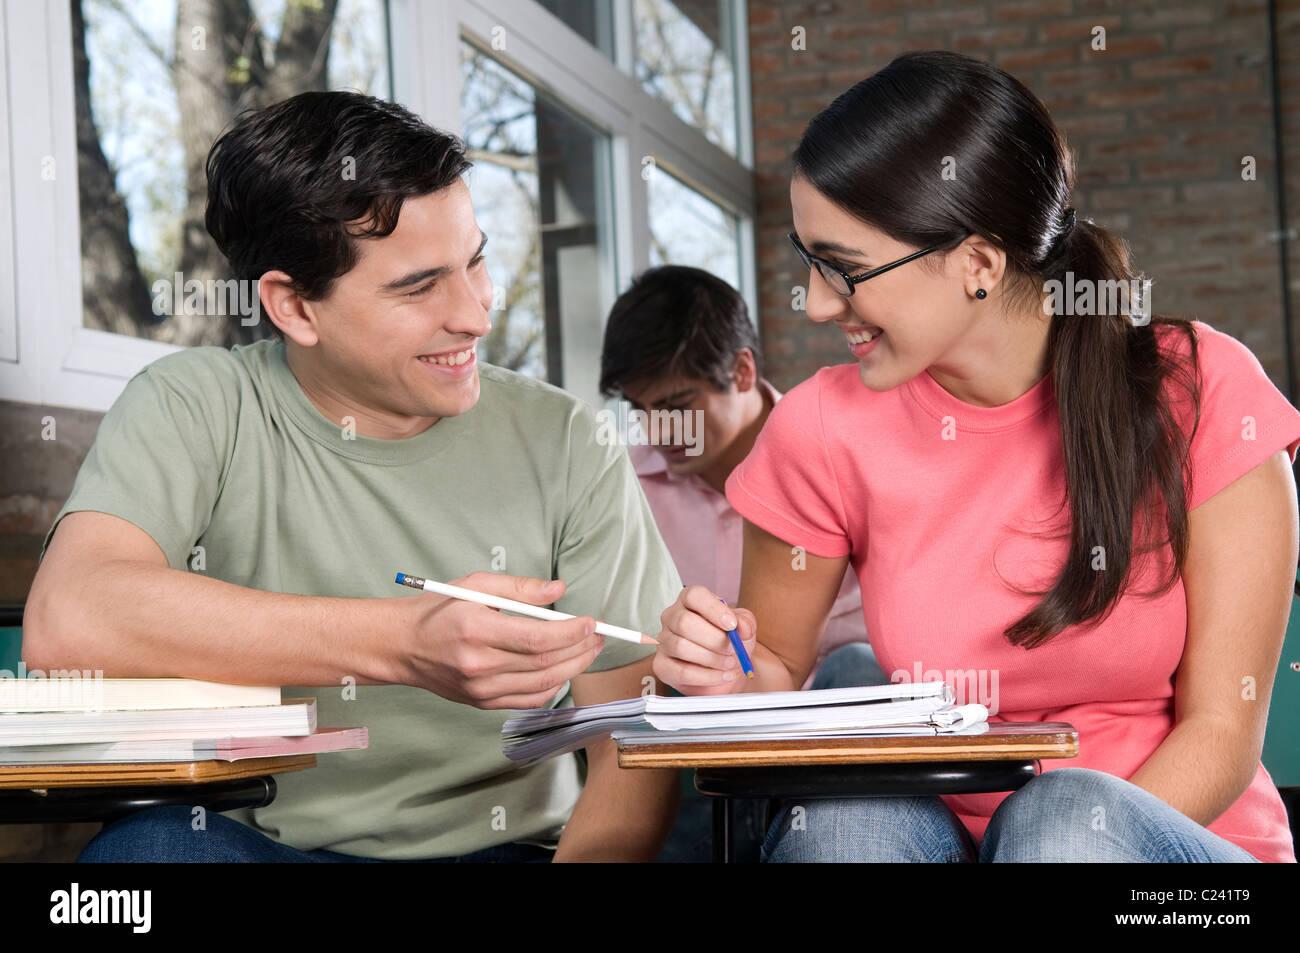 school discipline essay dropouts